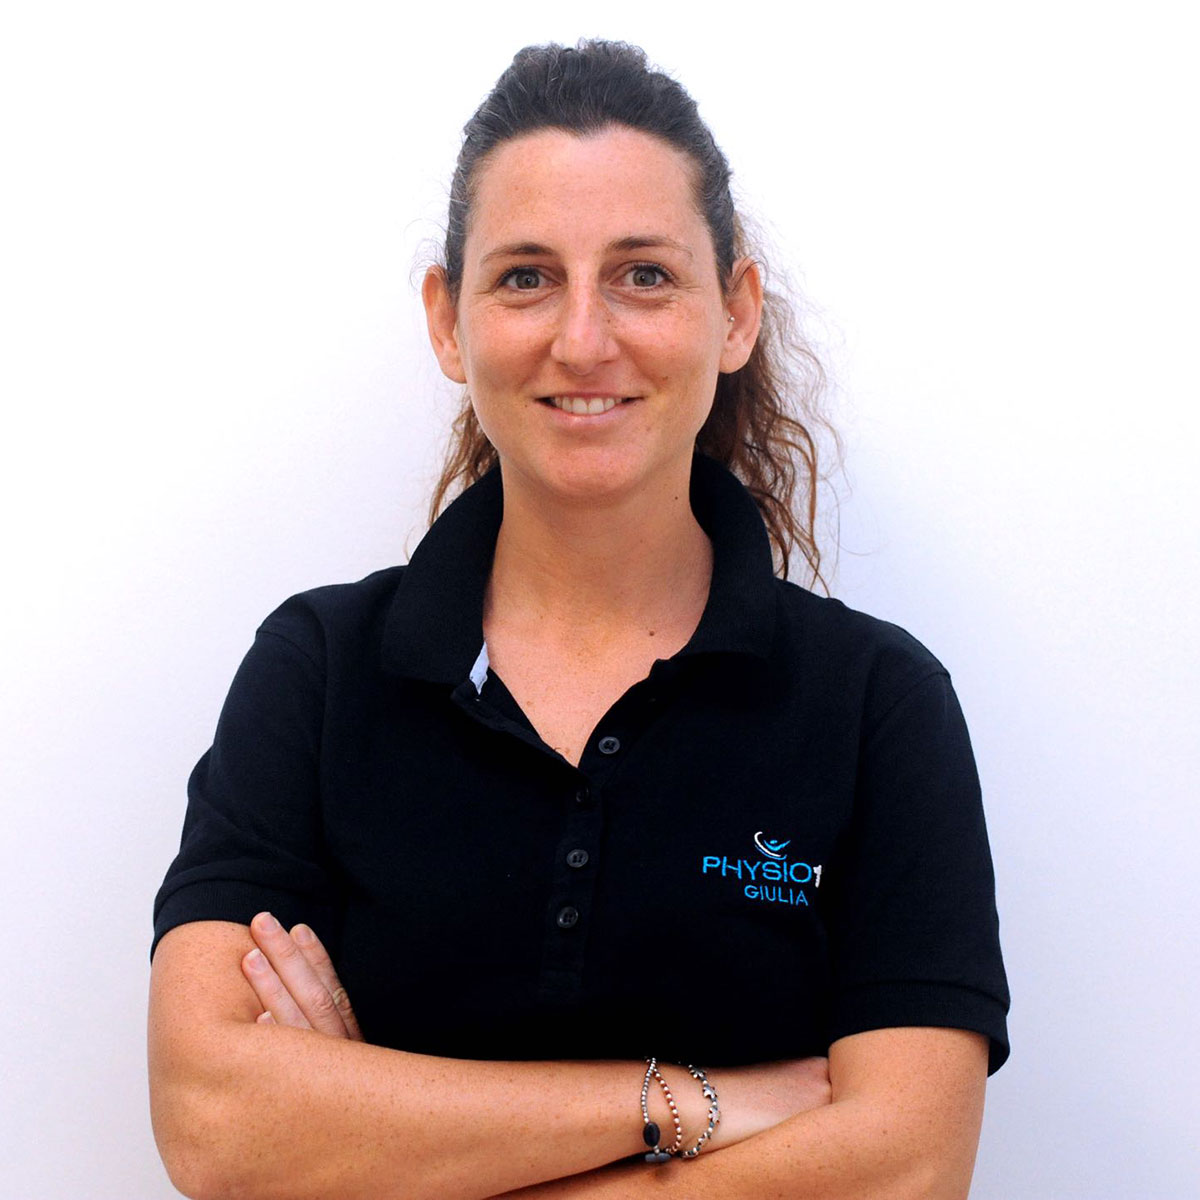 Dott.ssa Giulia Raspugli -Laureata in scienze motorie